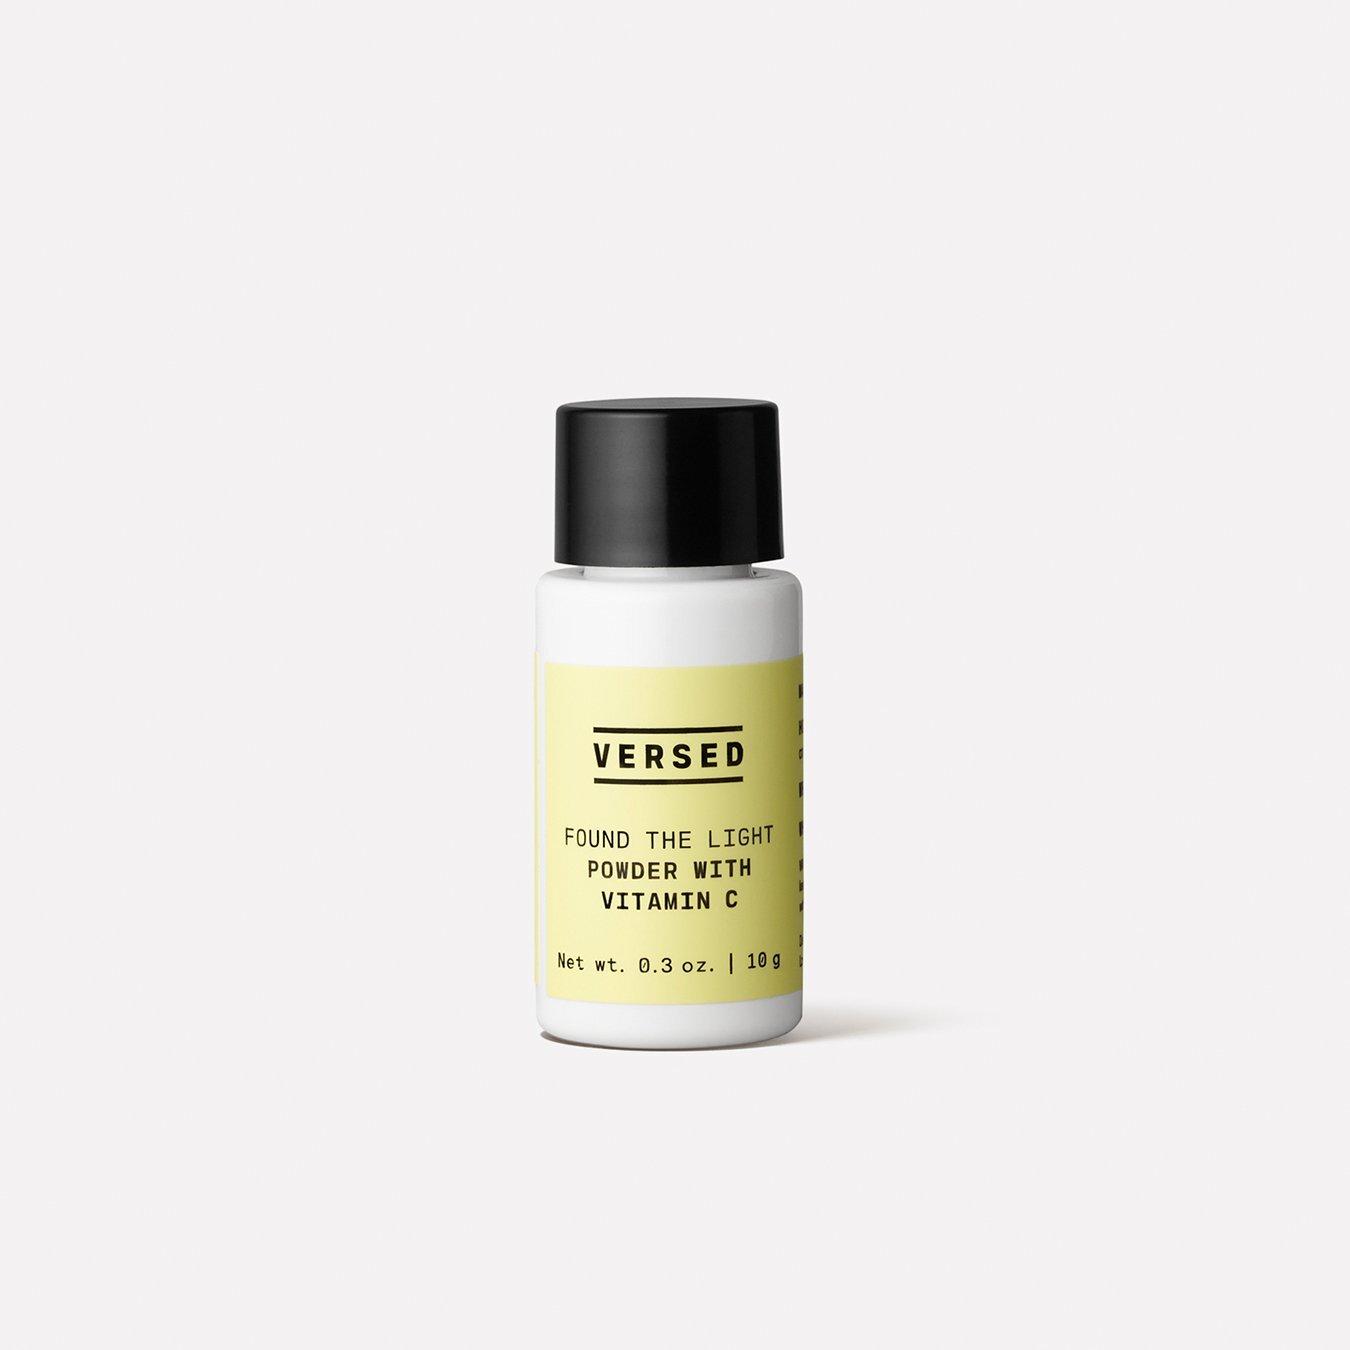 Versed-Skincare-Found-The-Light-Vitamin-C-Powder-01_1800x.jpg